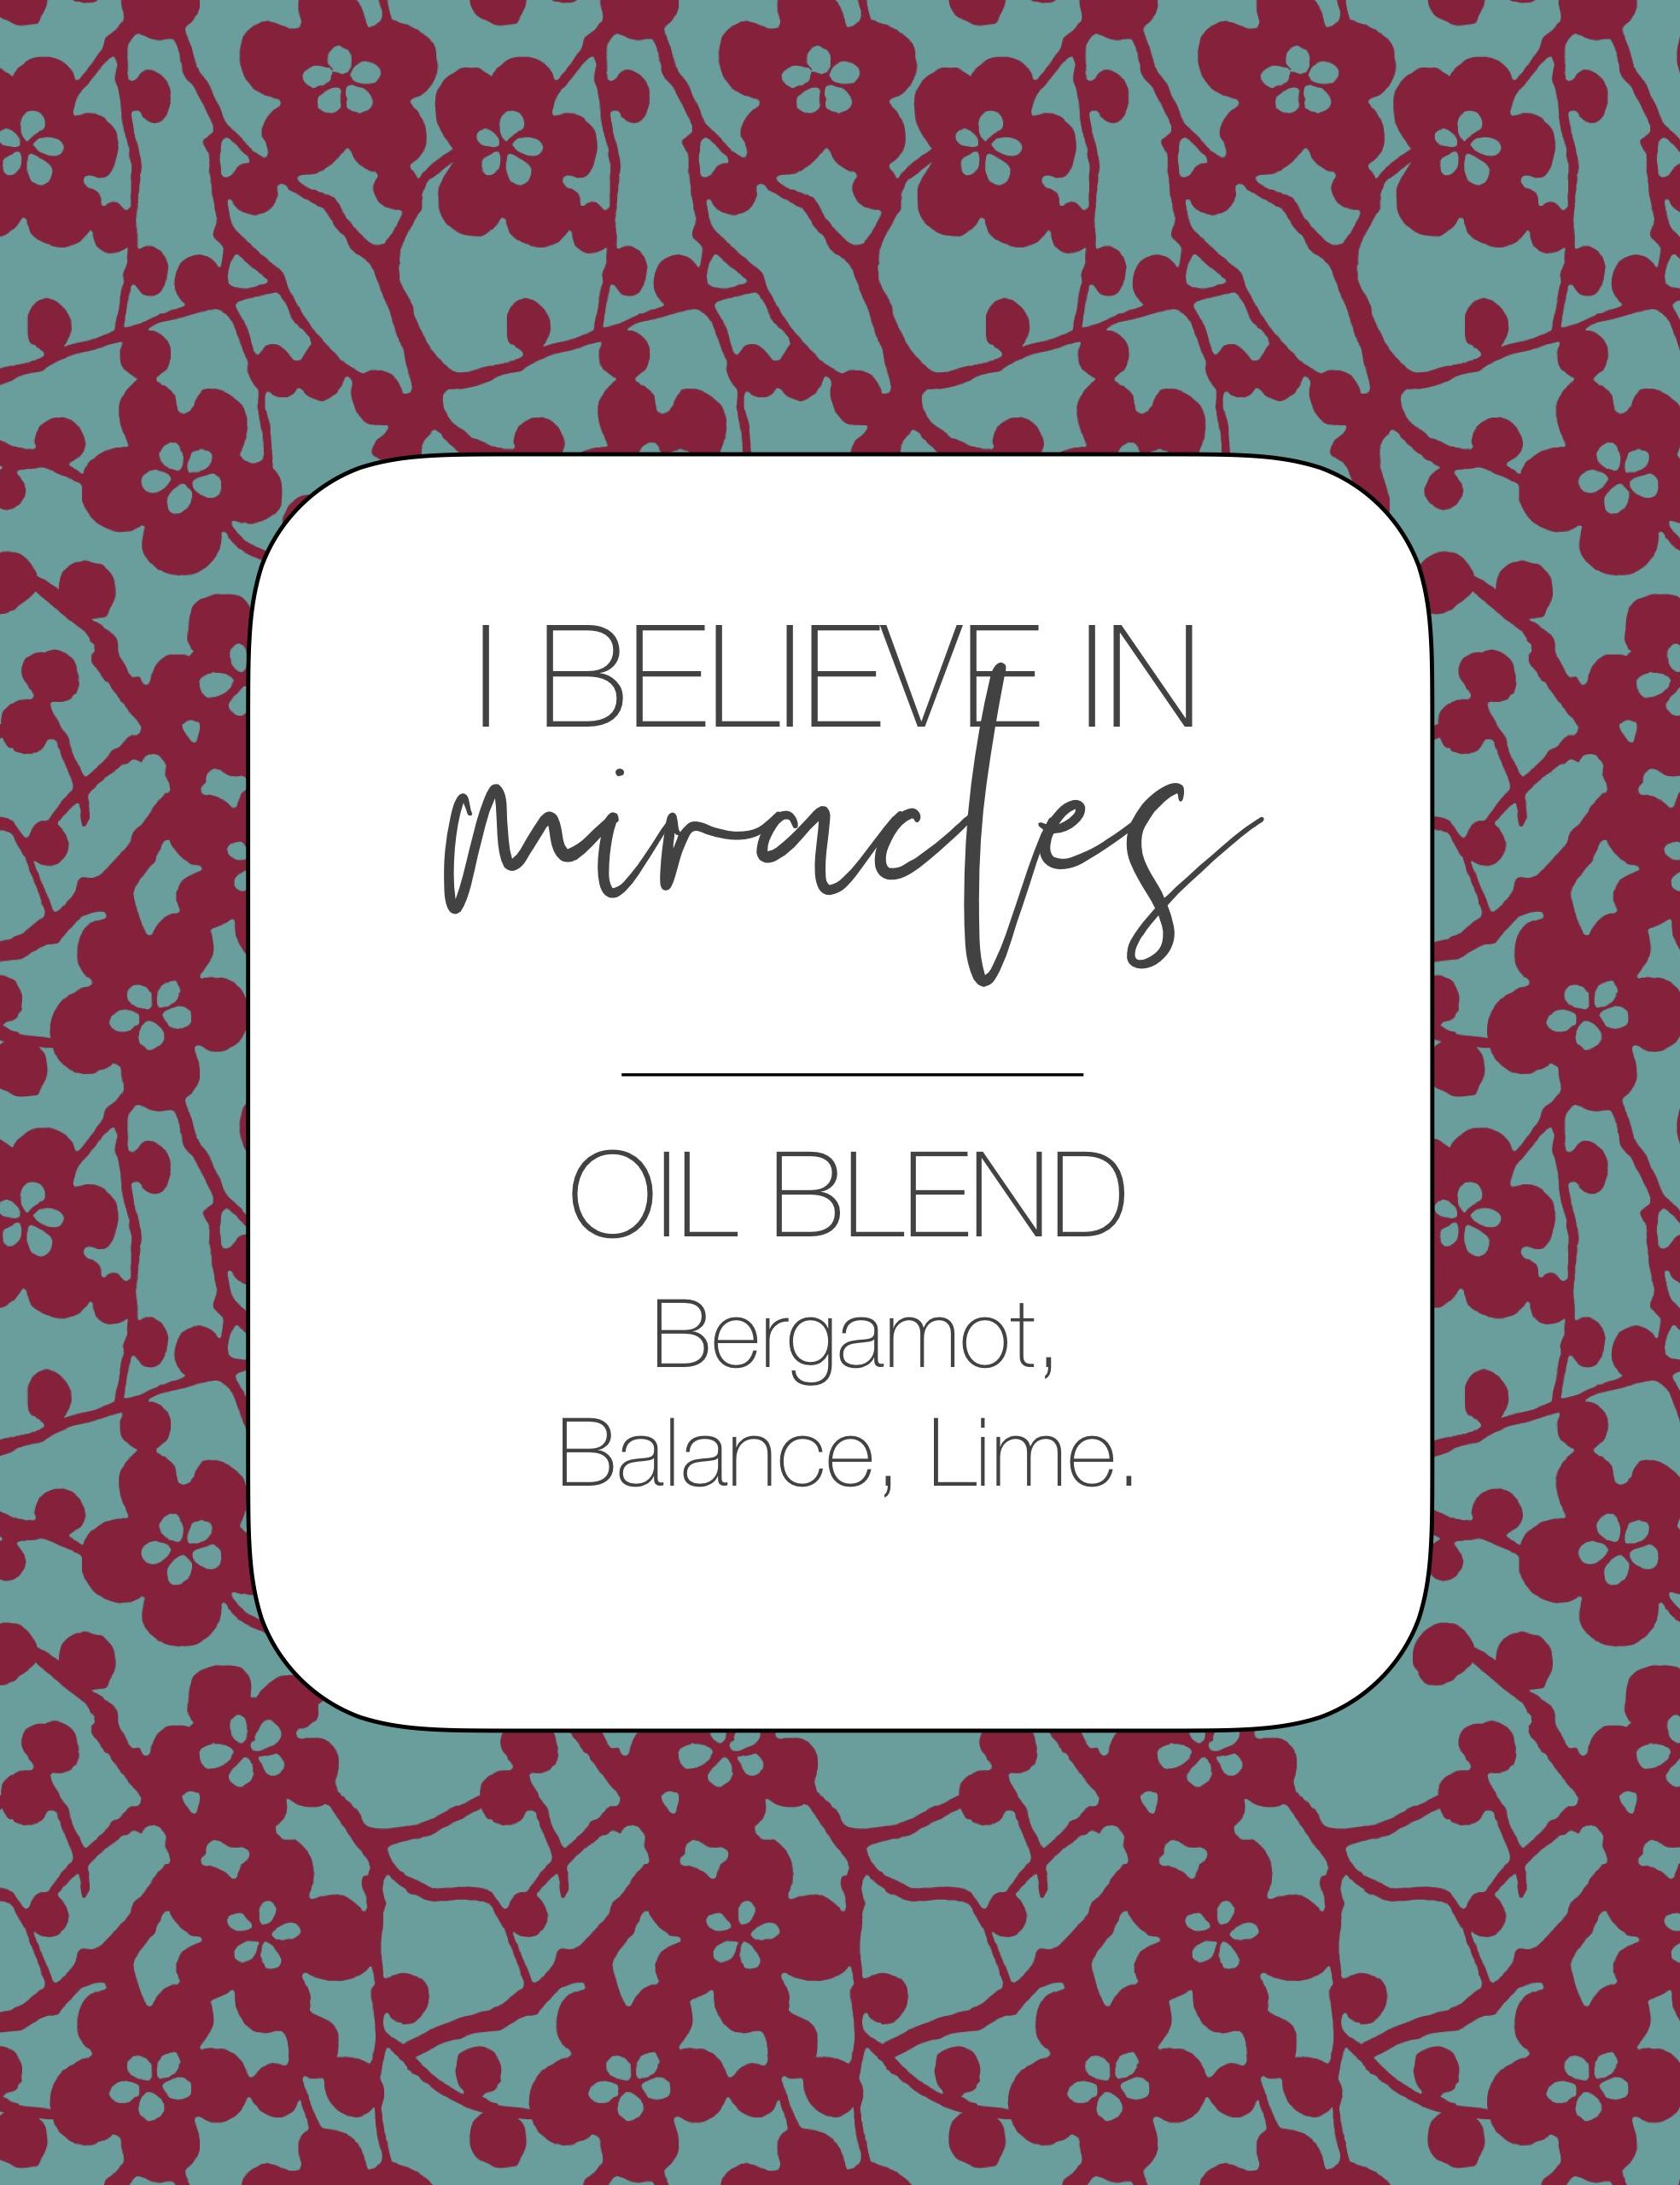 I-believe-in-miracles-10ml-Roller-Bottle-Blend-JPEG.jpg